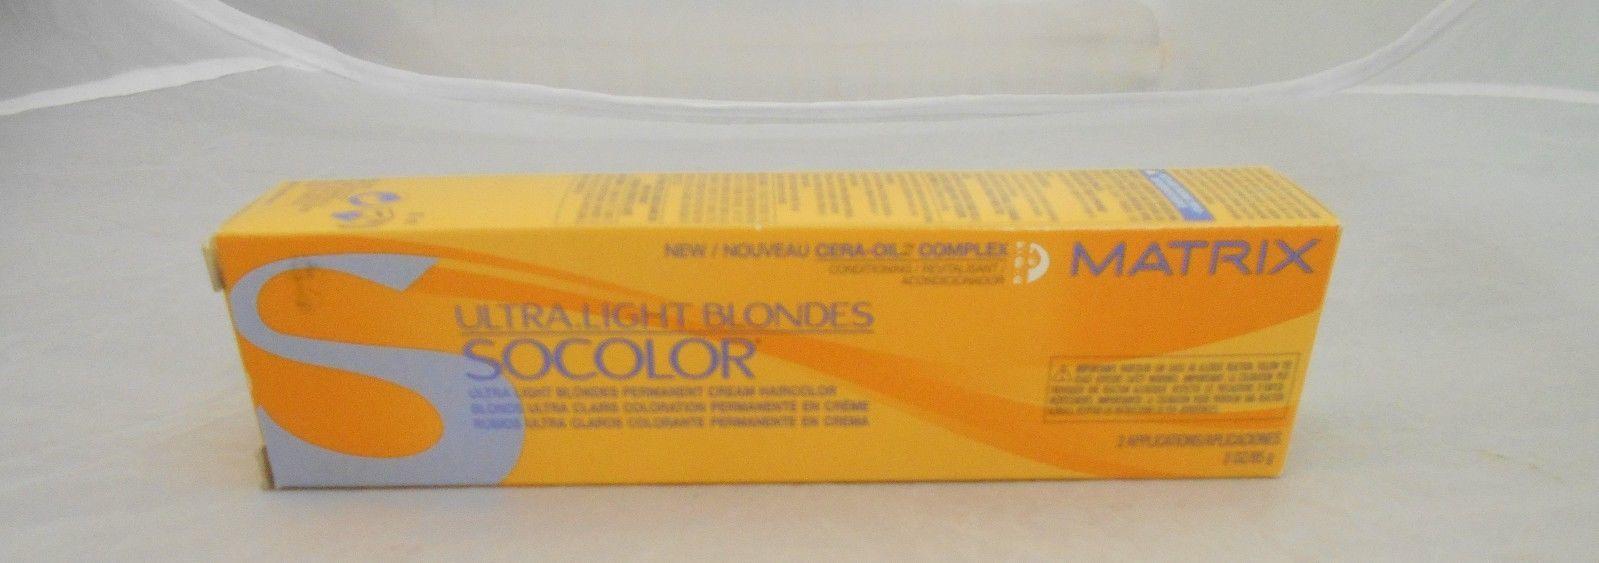 Matrix Ultraght Blonde Socolor Cera Oil And 50 Similar Items